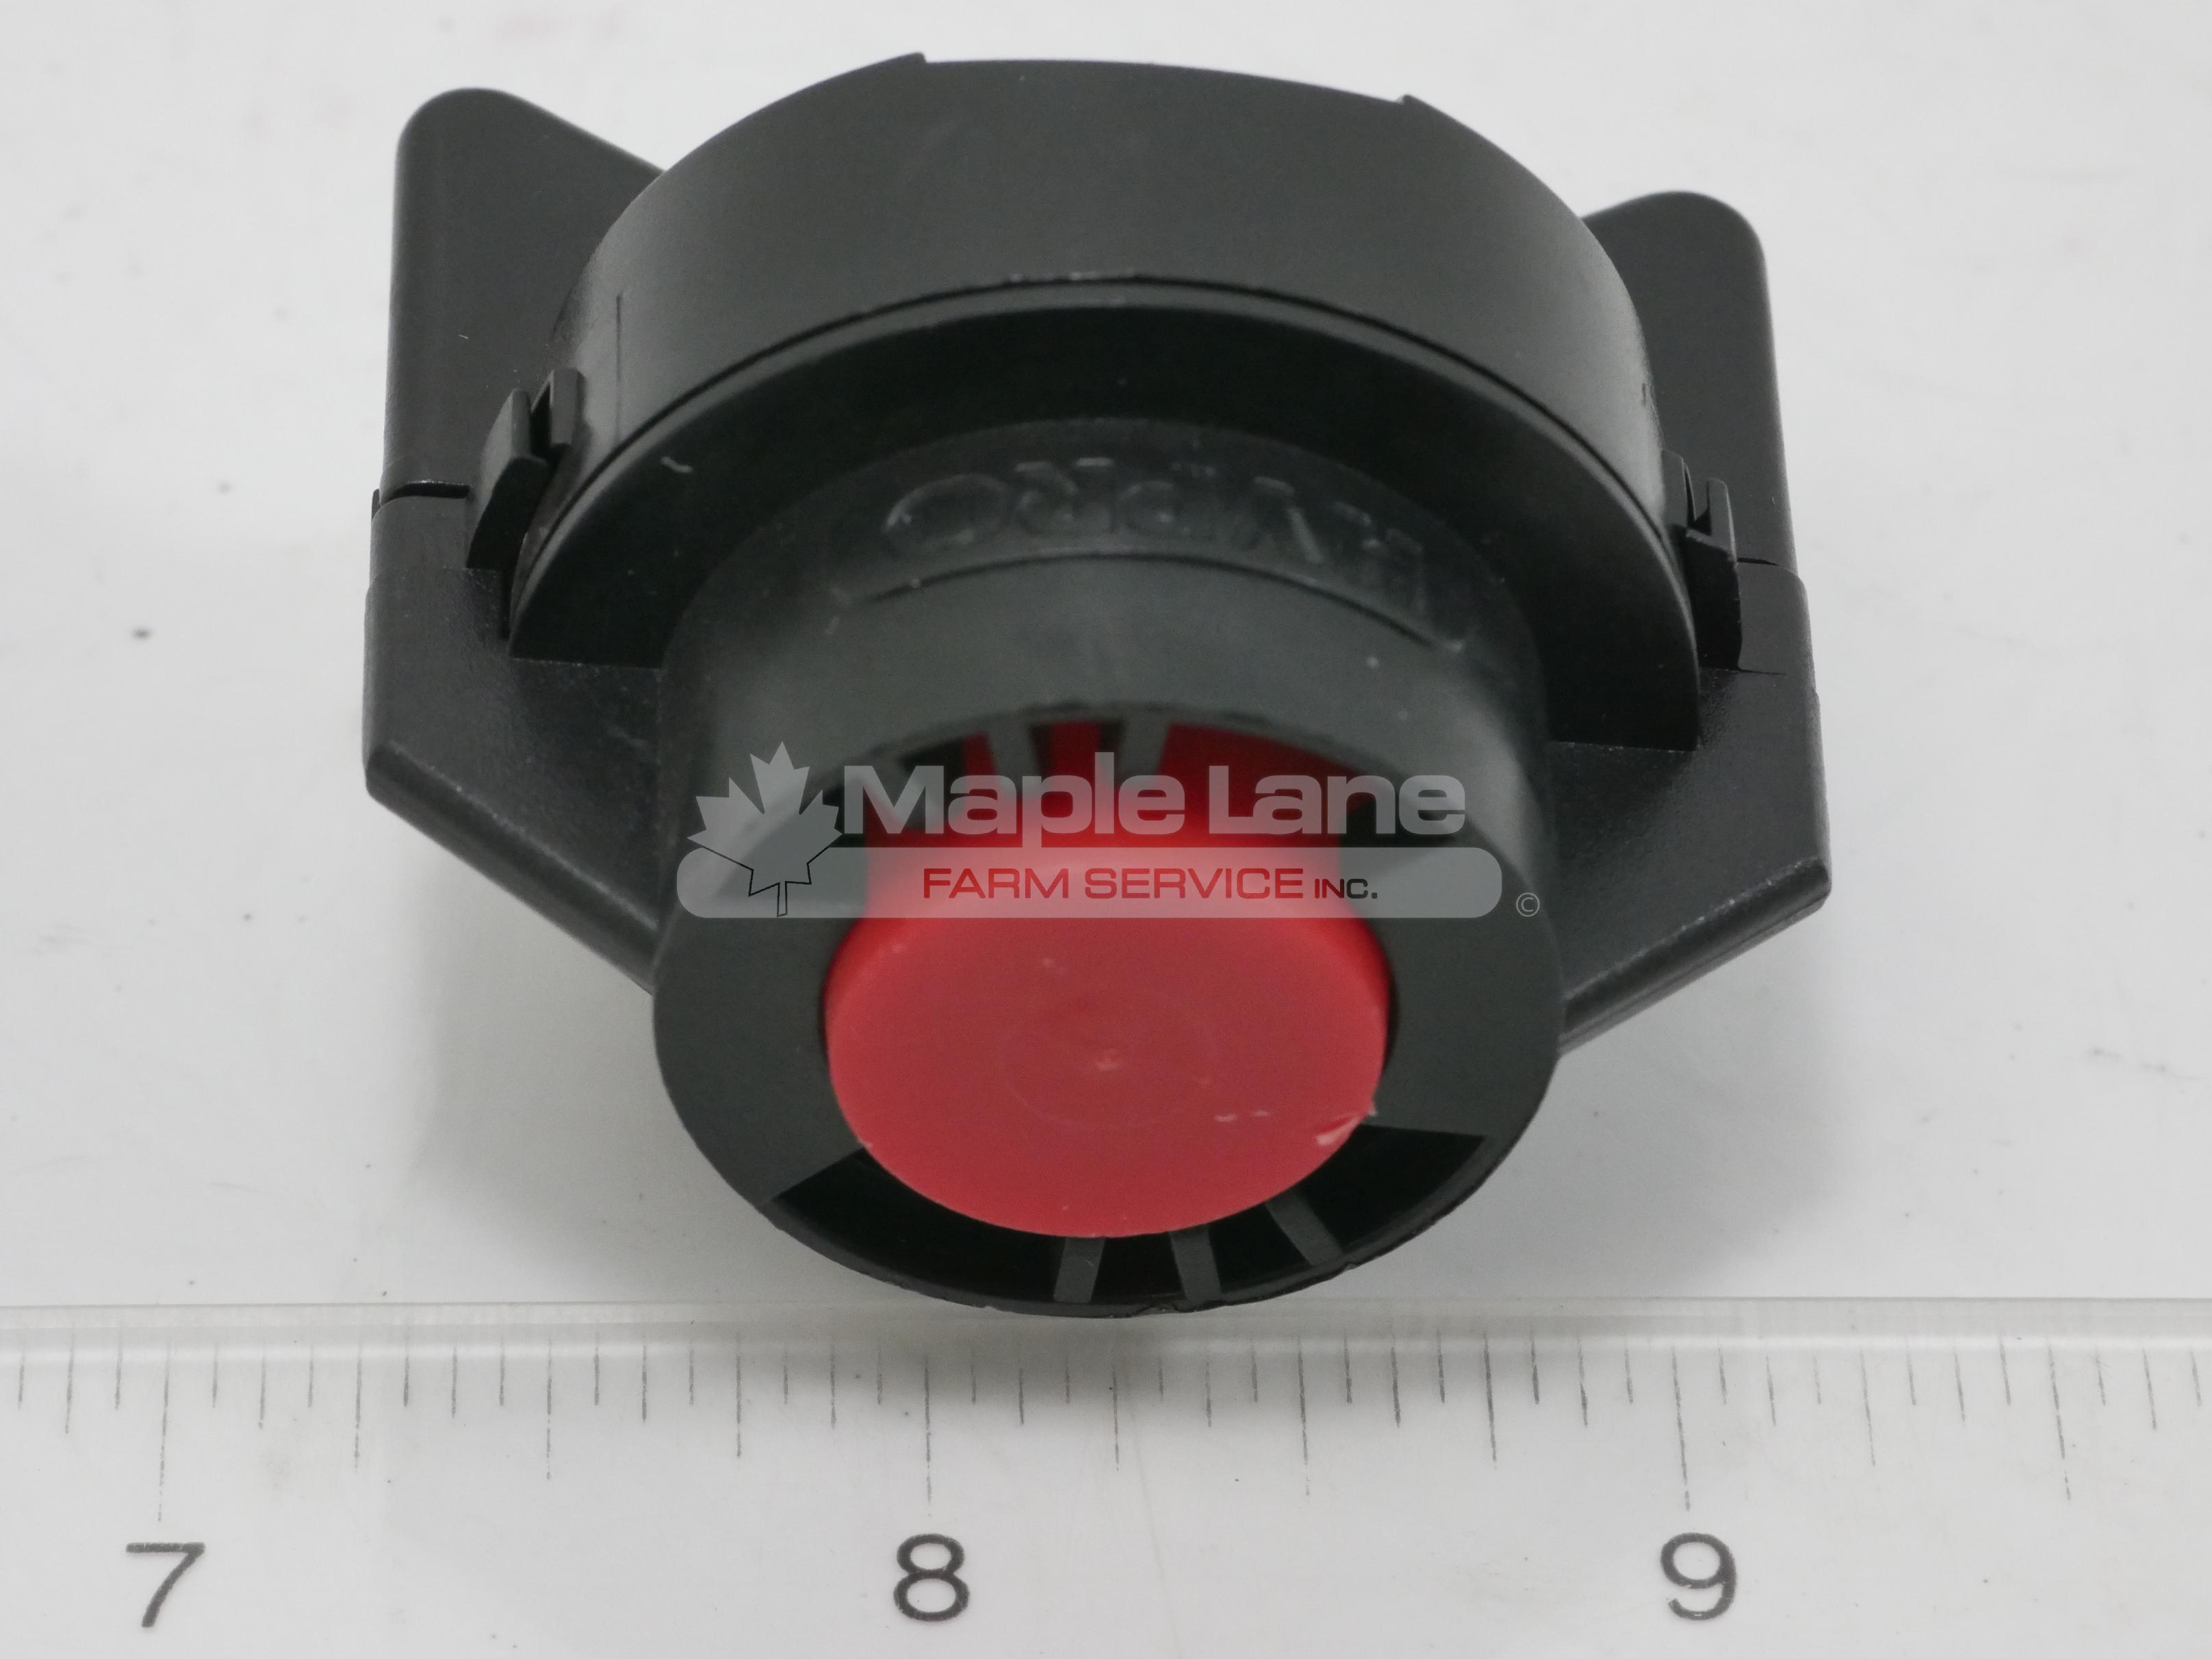 ag426086 nozzle holder